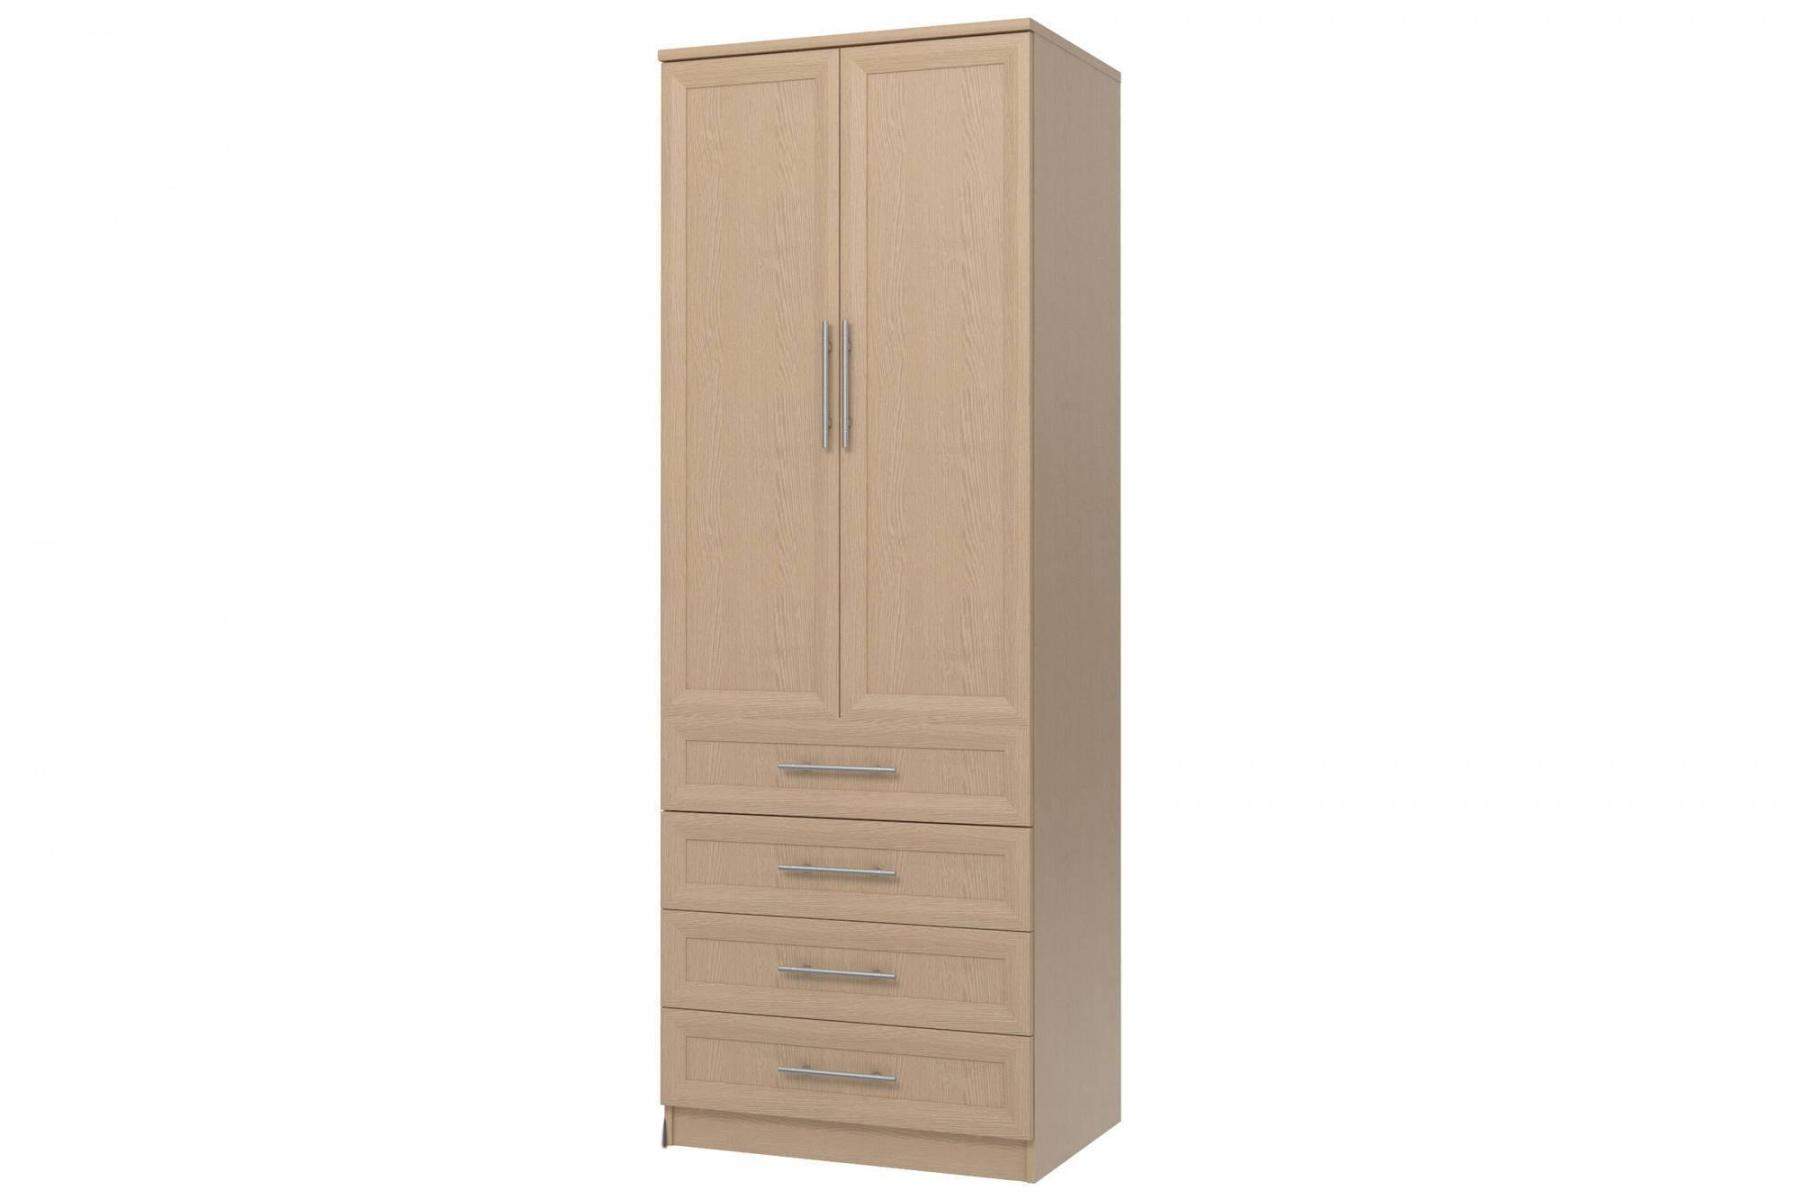 Шкаф 2-х дверный с 4-мя ящ. Юлианна СТЛ.004.01-01М